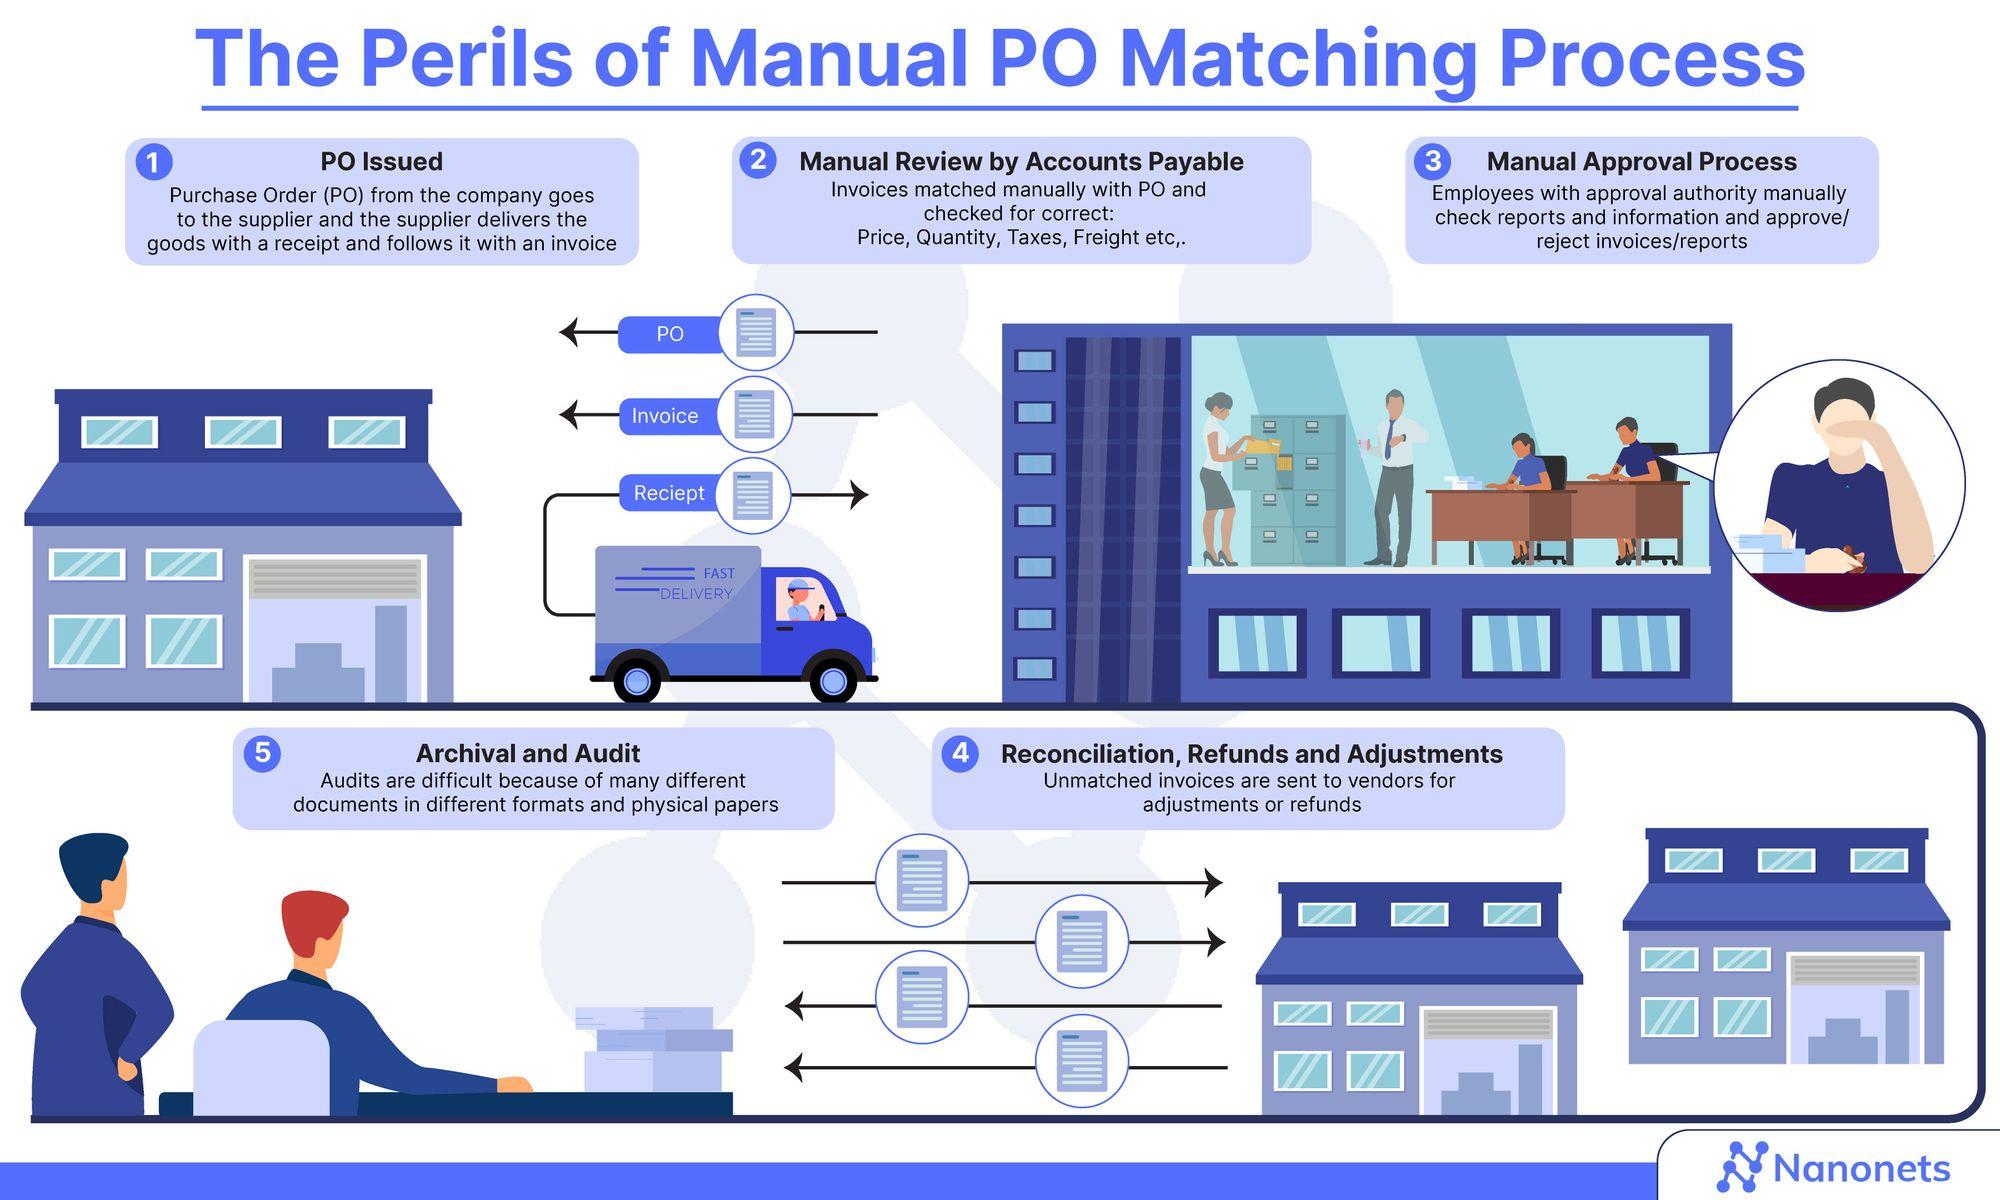 A typical manual PO matching process